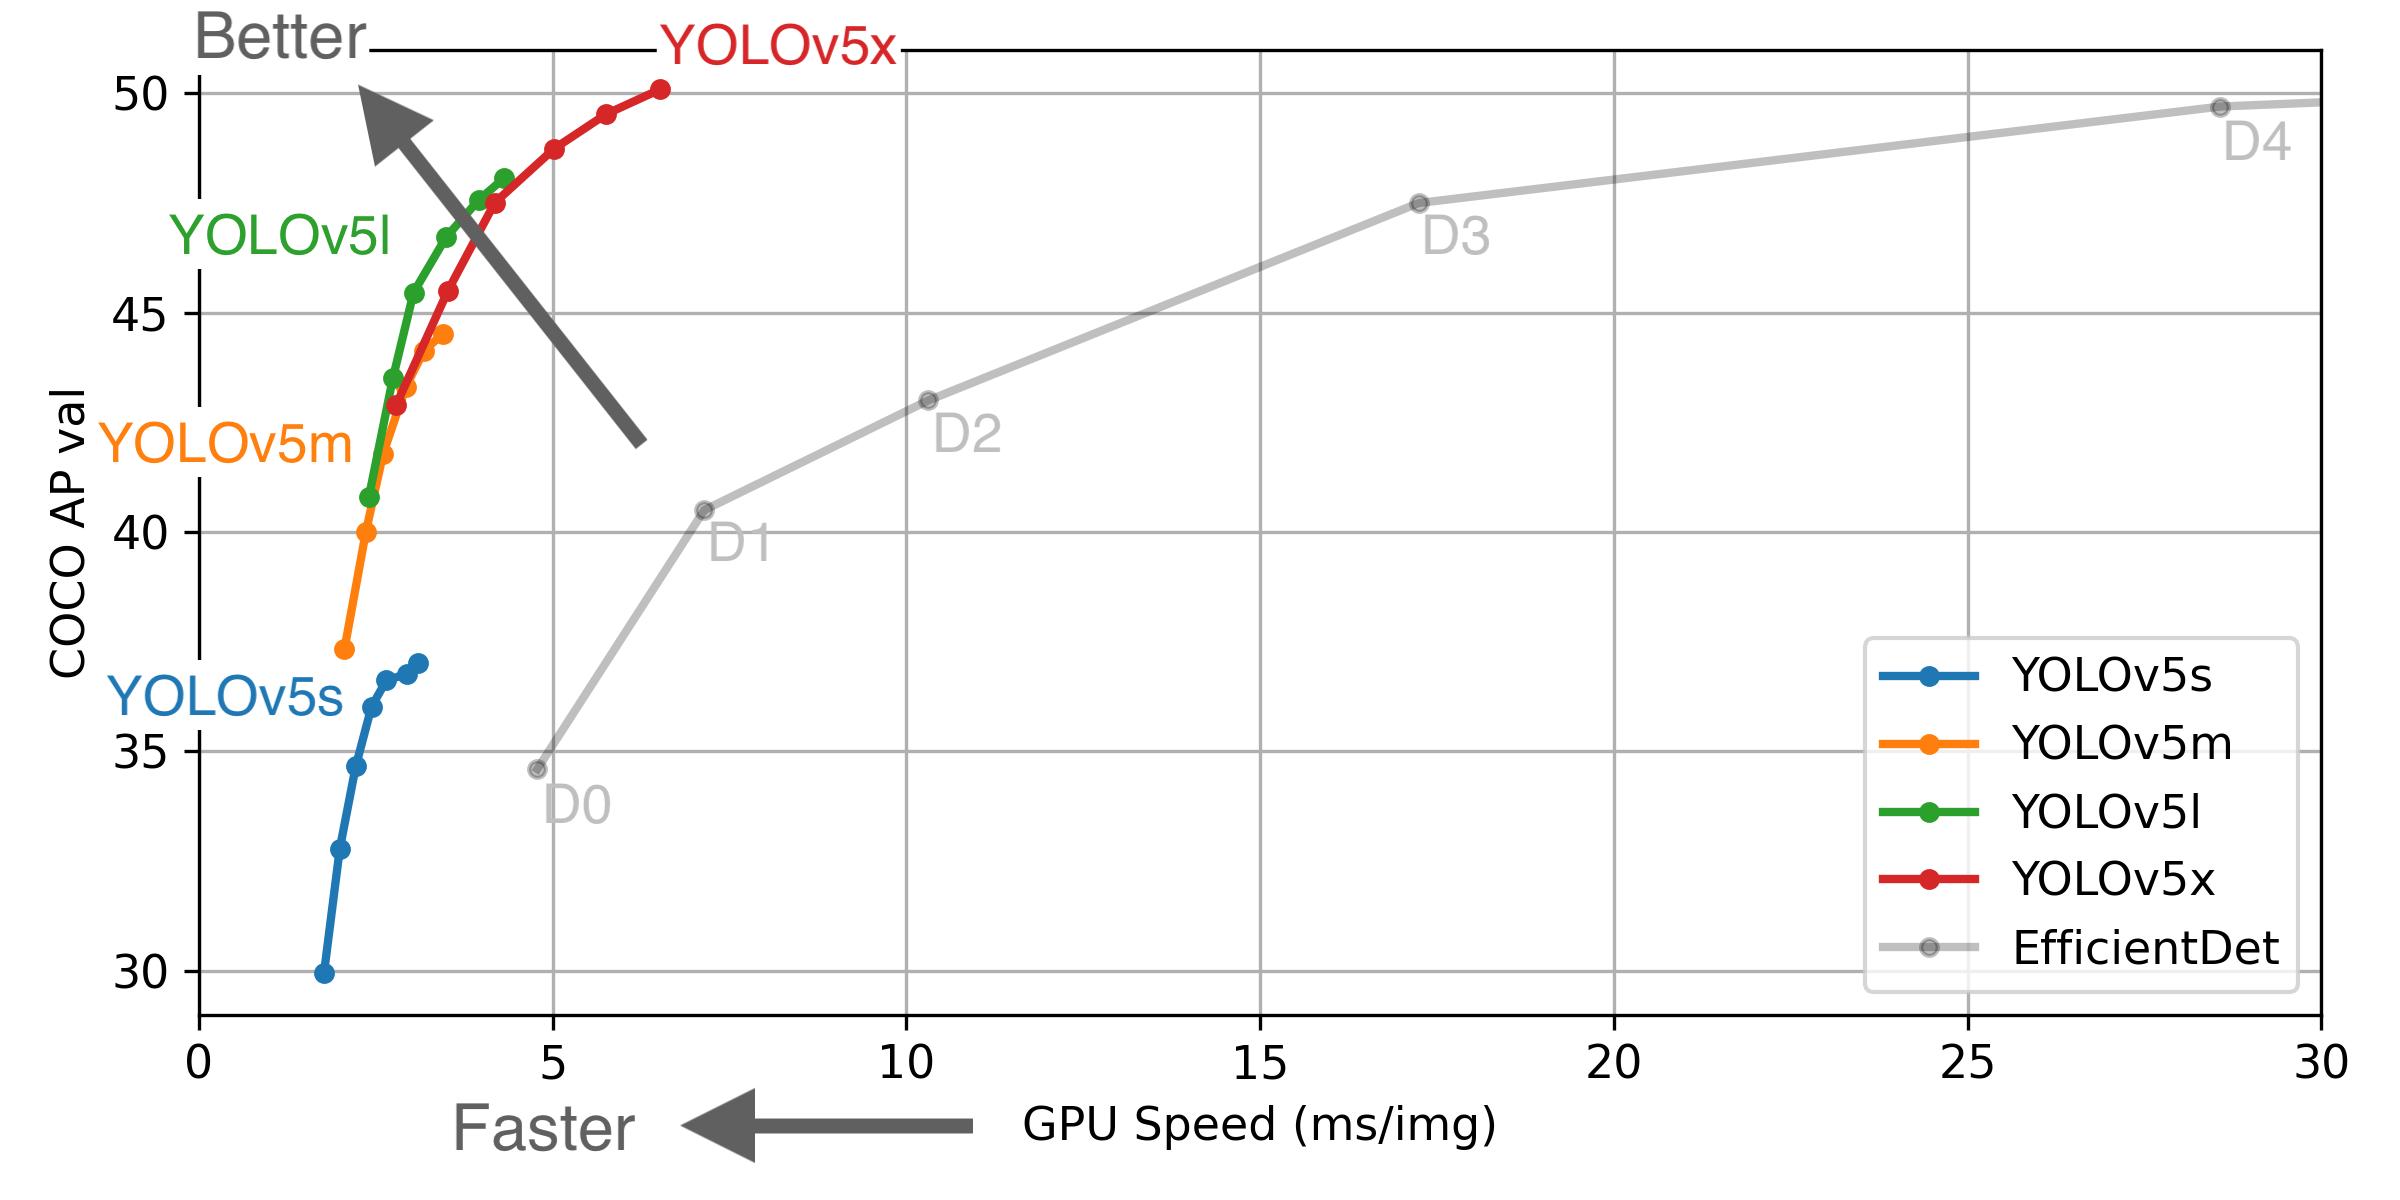 YOLOv5 Performance